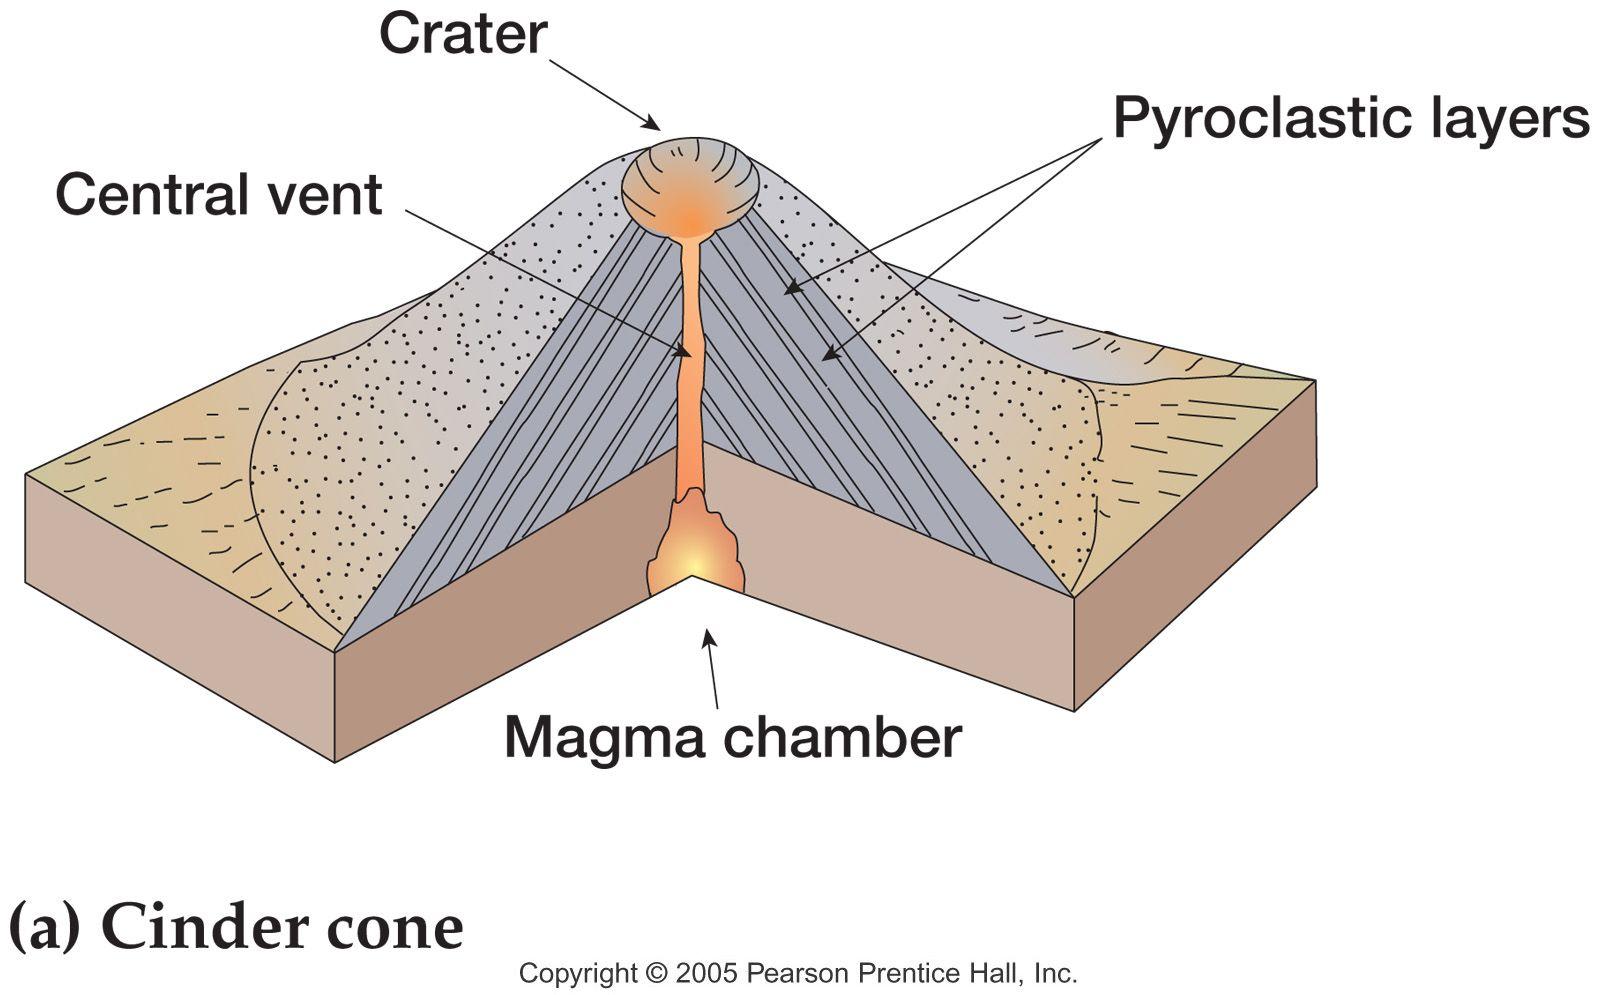 Cinder cone volcano formation diagram electrical work wiring diagram cinder cone volcanoes diagram science fair ideas pinterest rh pinterest com cinder cone volcano examples cinder cone volcano diagram ccuart Images